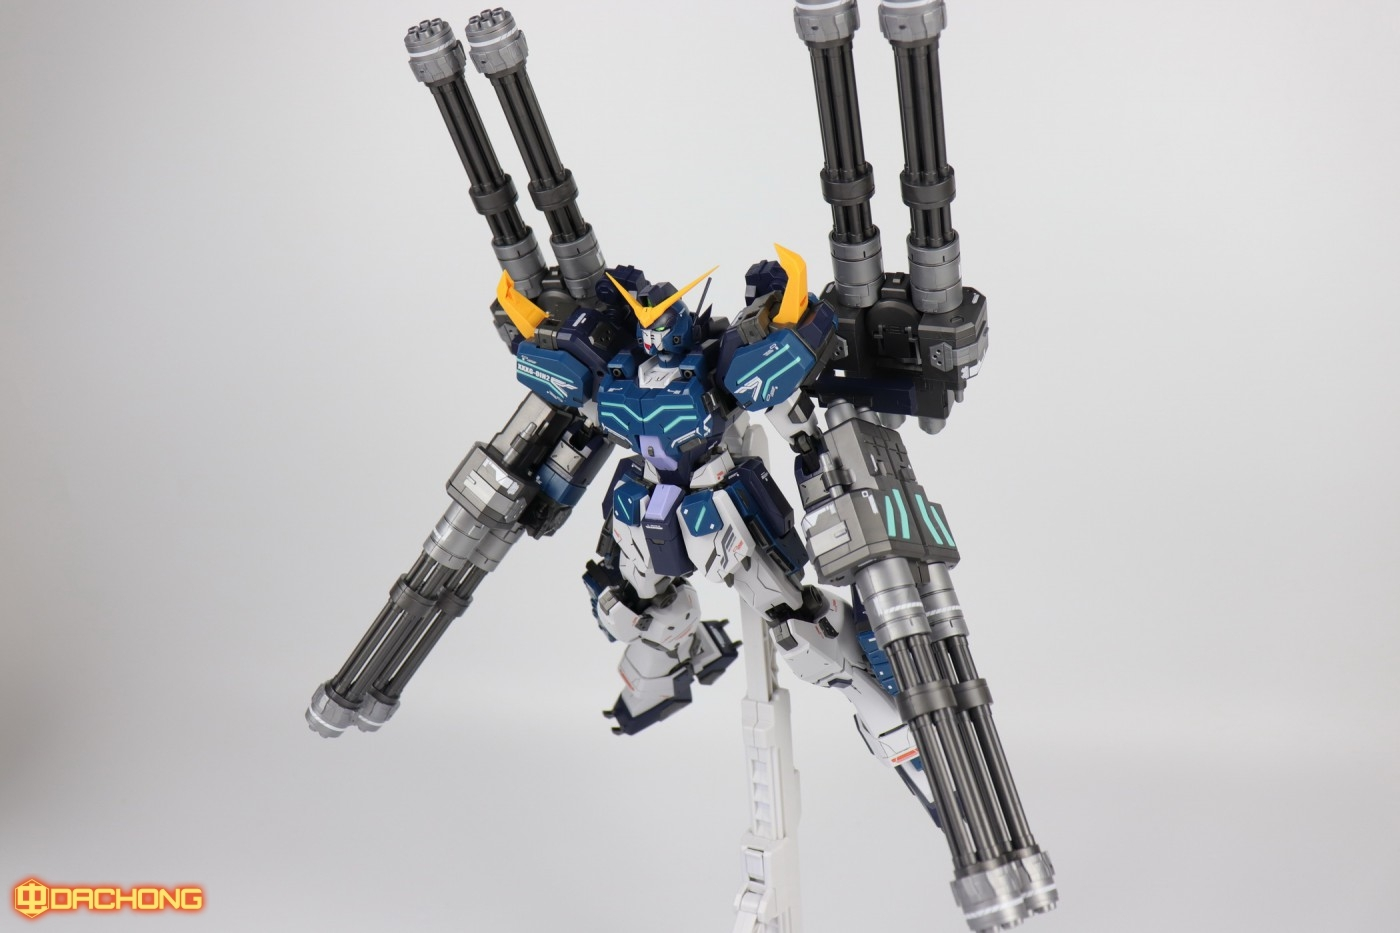 S296_MG_heavy_104.jpg